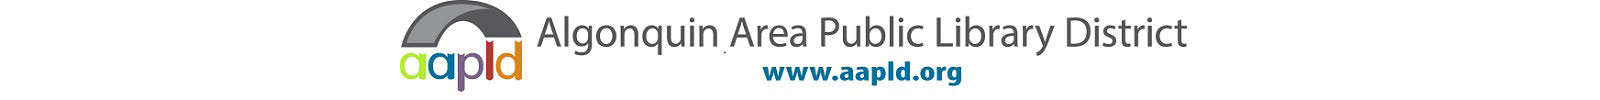 Algonquin Area Public Library/></a>   <div class=